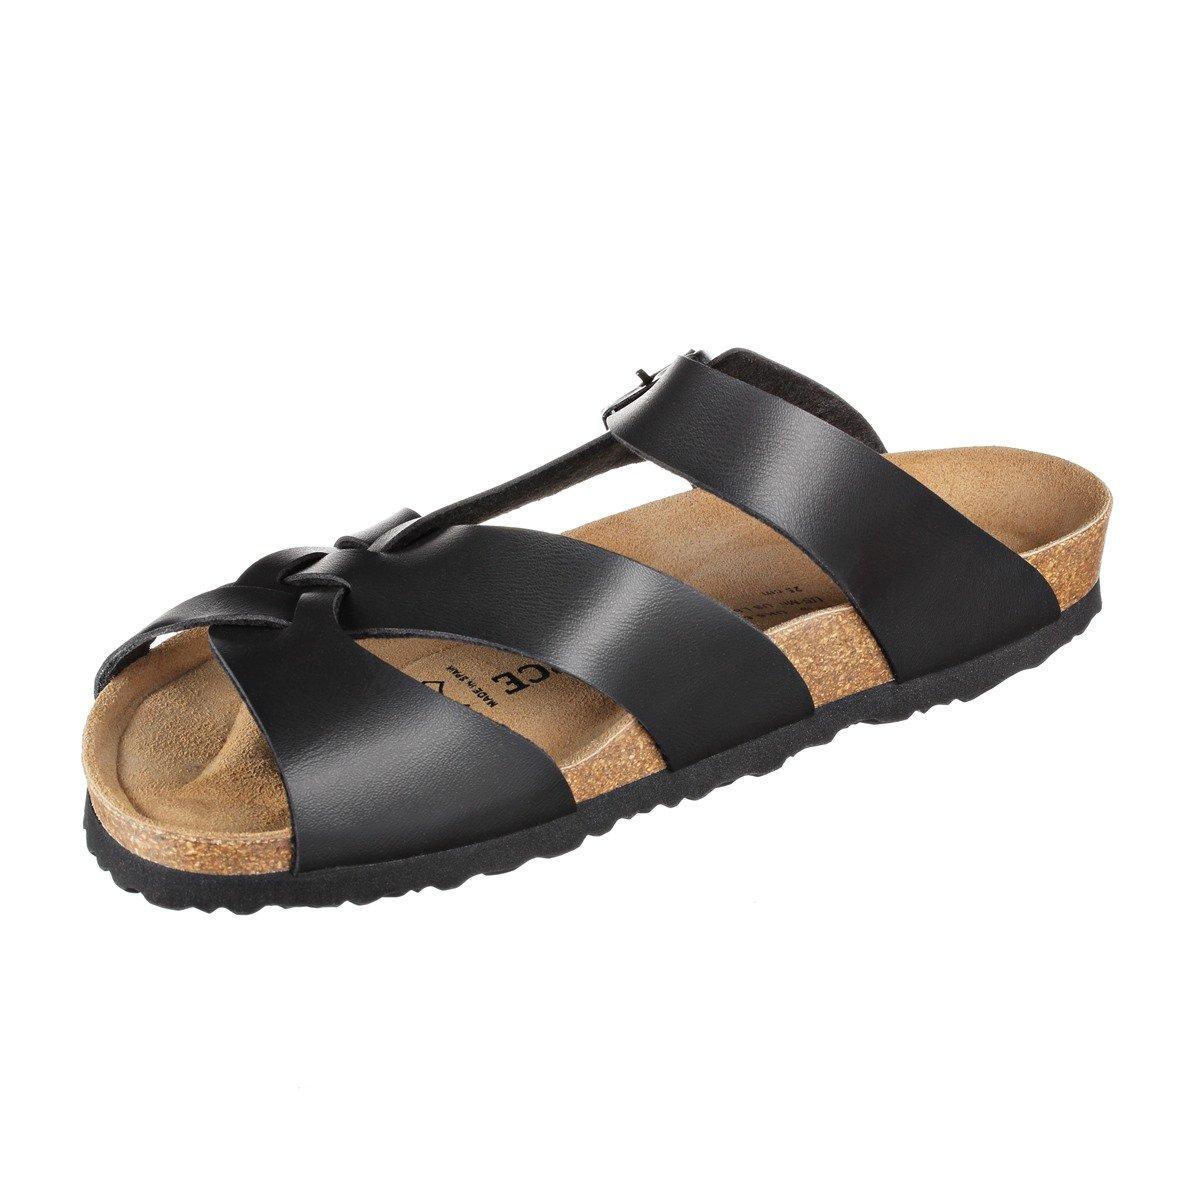 JOE N JOYCE Womens Athen SynSoft Soft-Footbed Synthetic Mules Regular Black Size EU 39 - US W8/M6